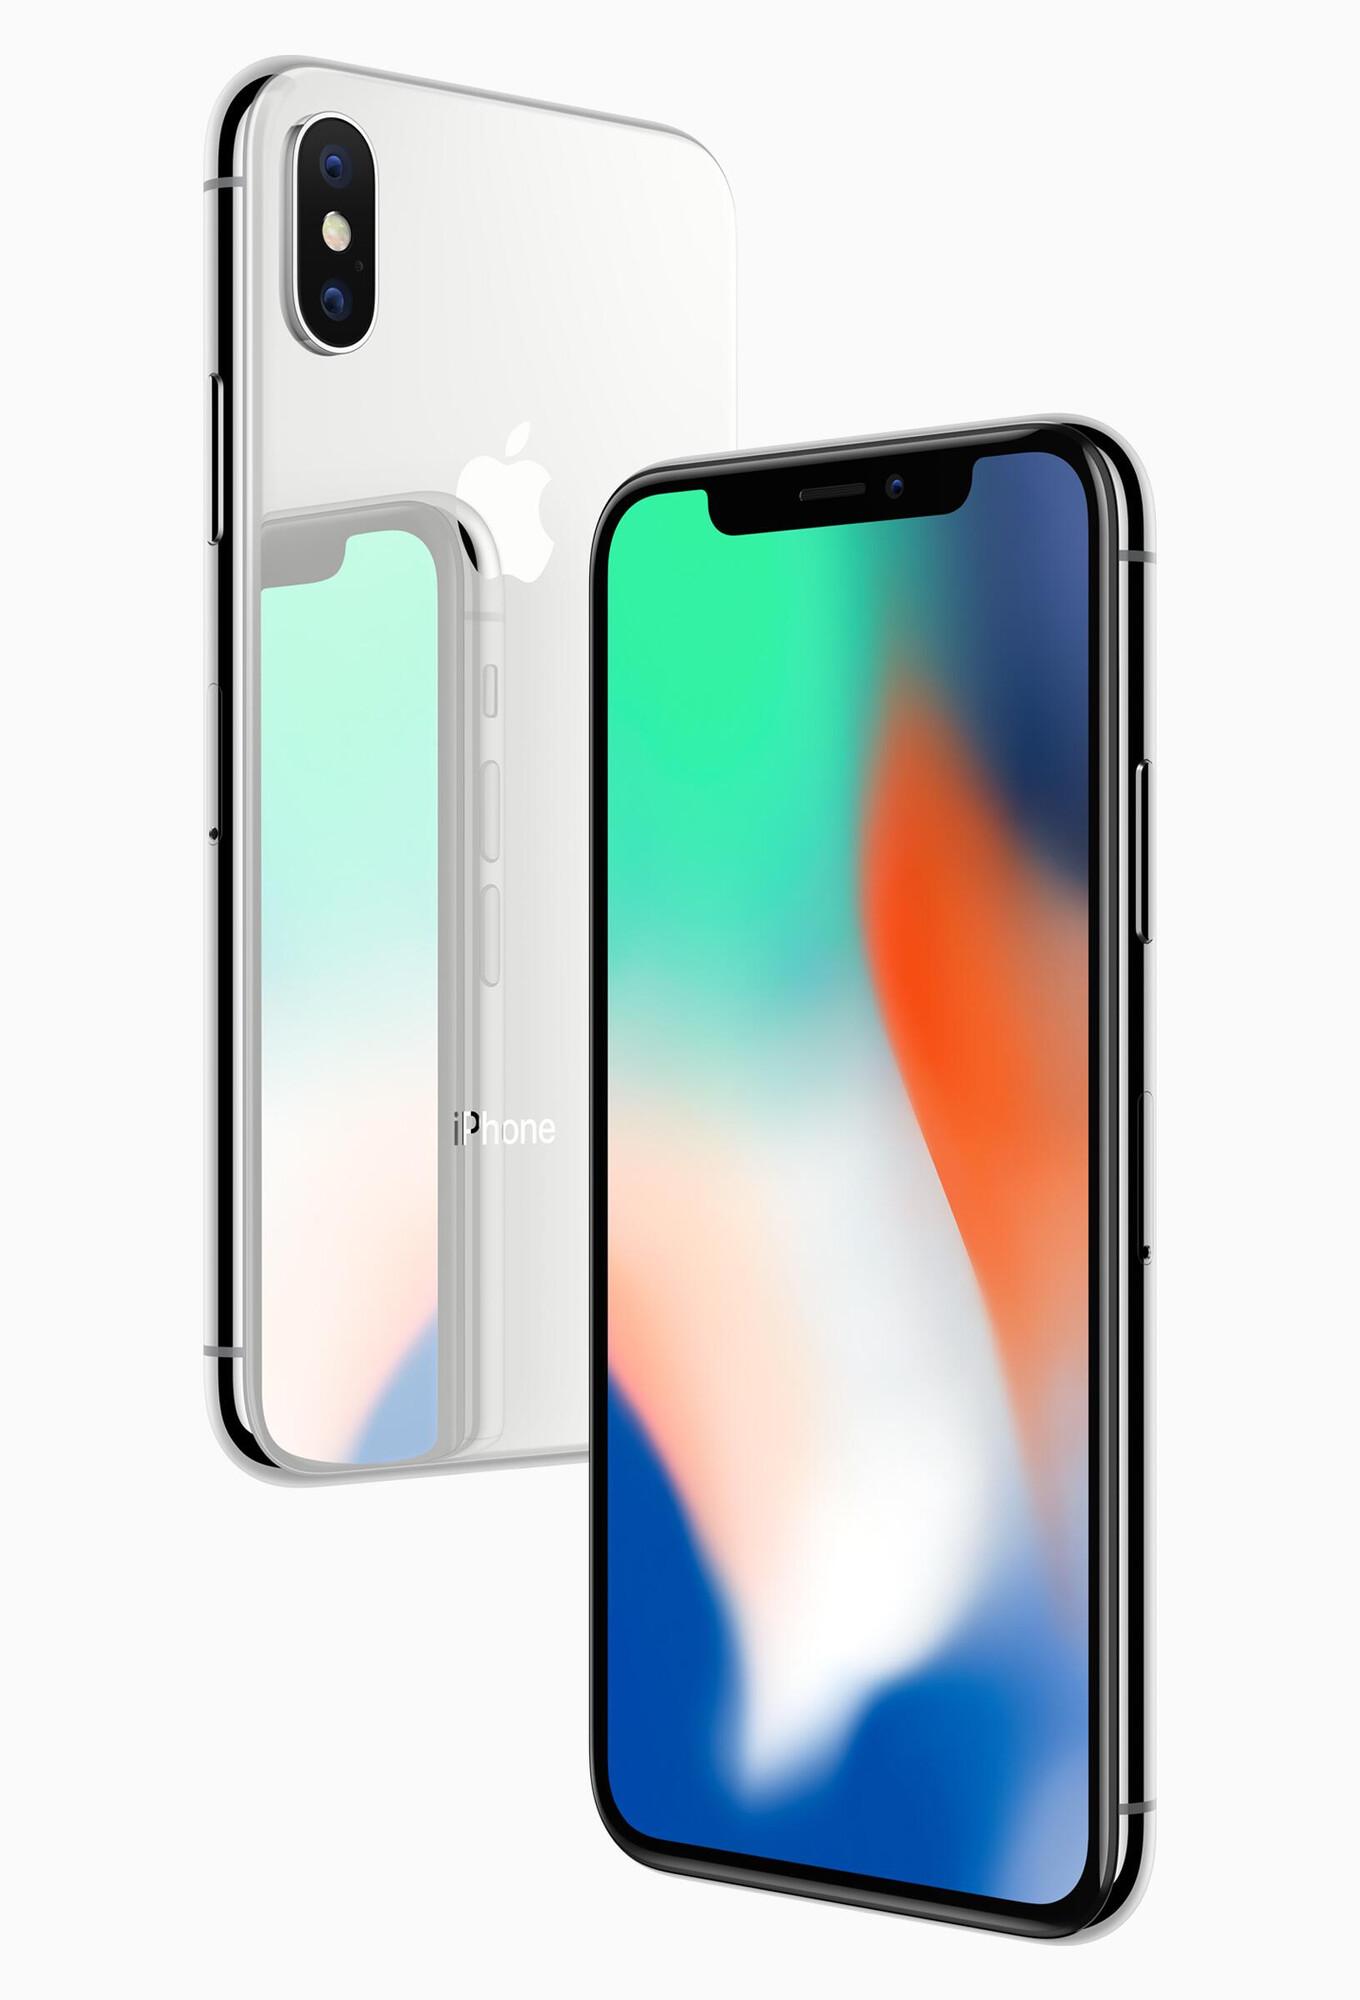 Apple iPhone X - 64GB - Silver - (Als Nieuw) A+ Grade